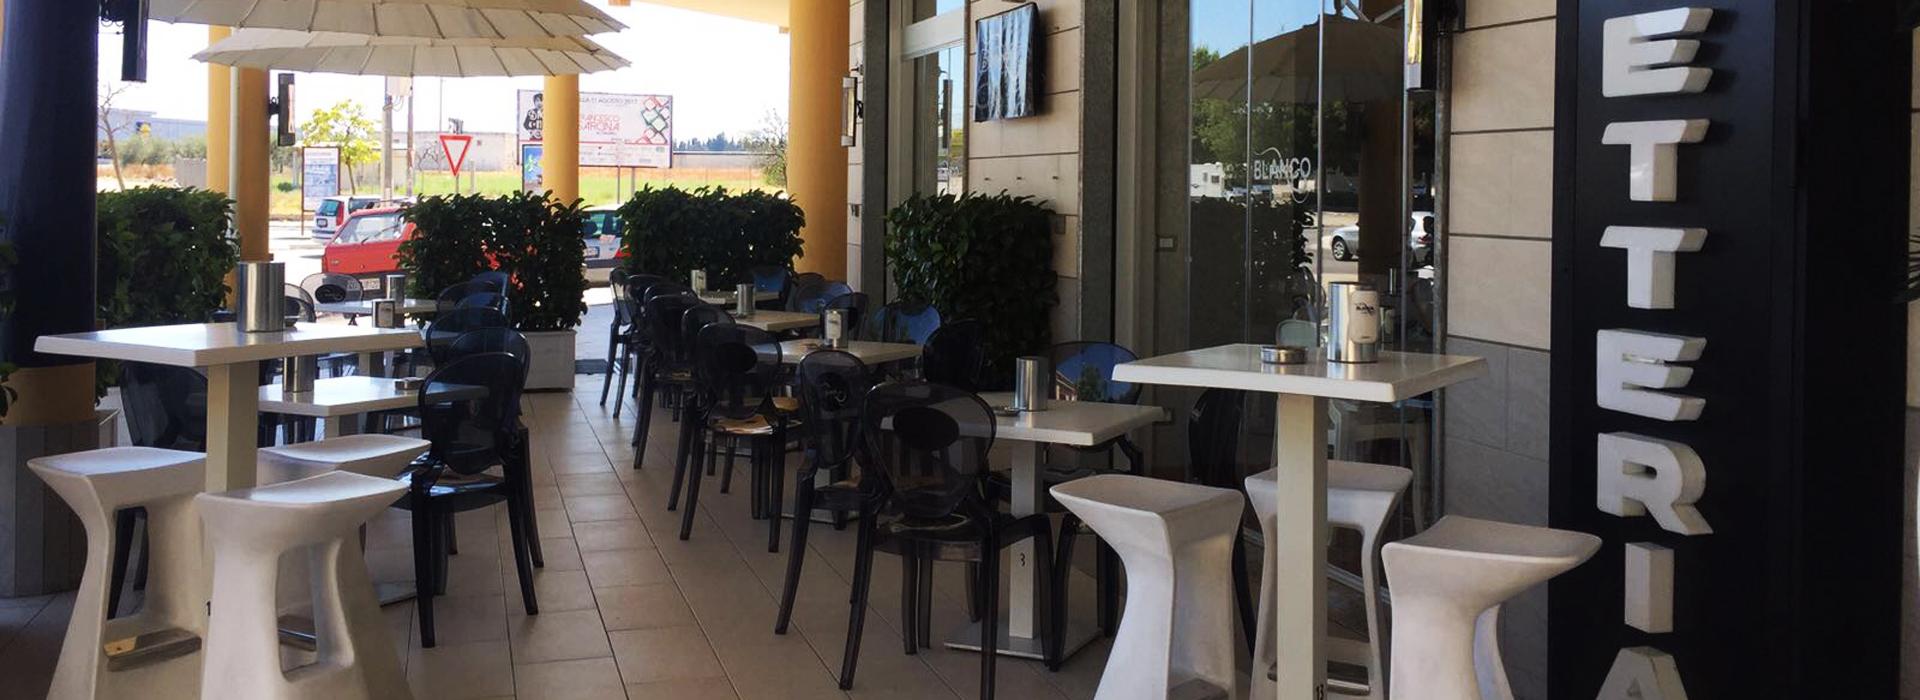 Caffetteria a Cerignola Foggia